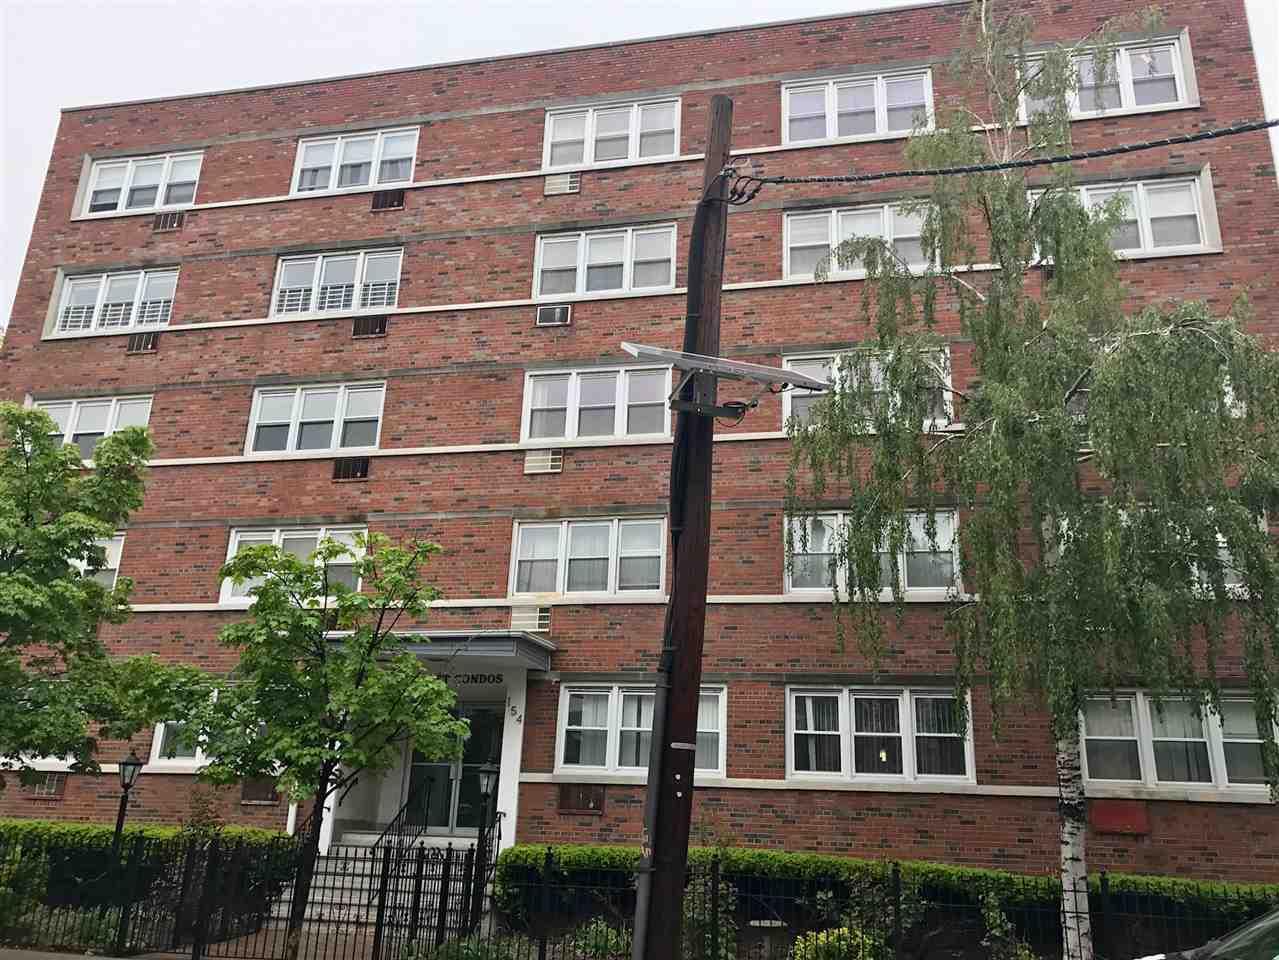 154 BOWERS ST 3C, JC, Heights, NJ 07302